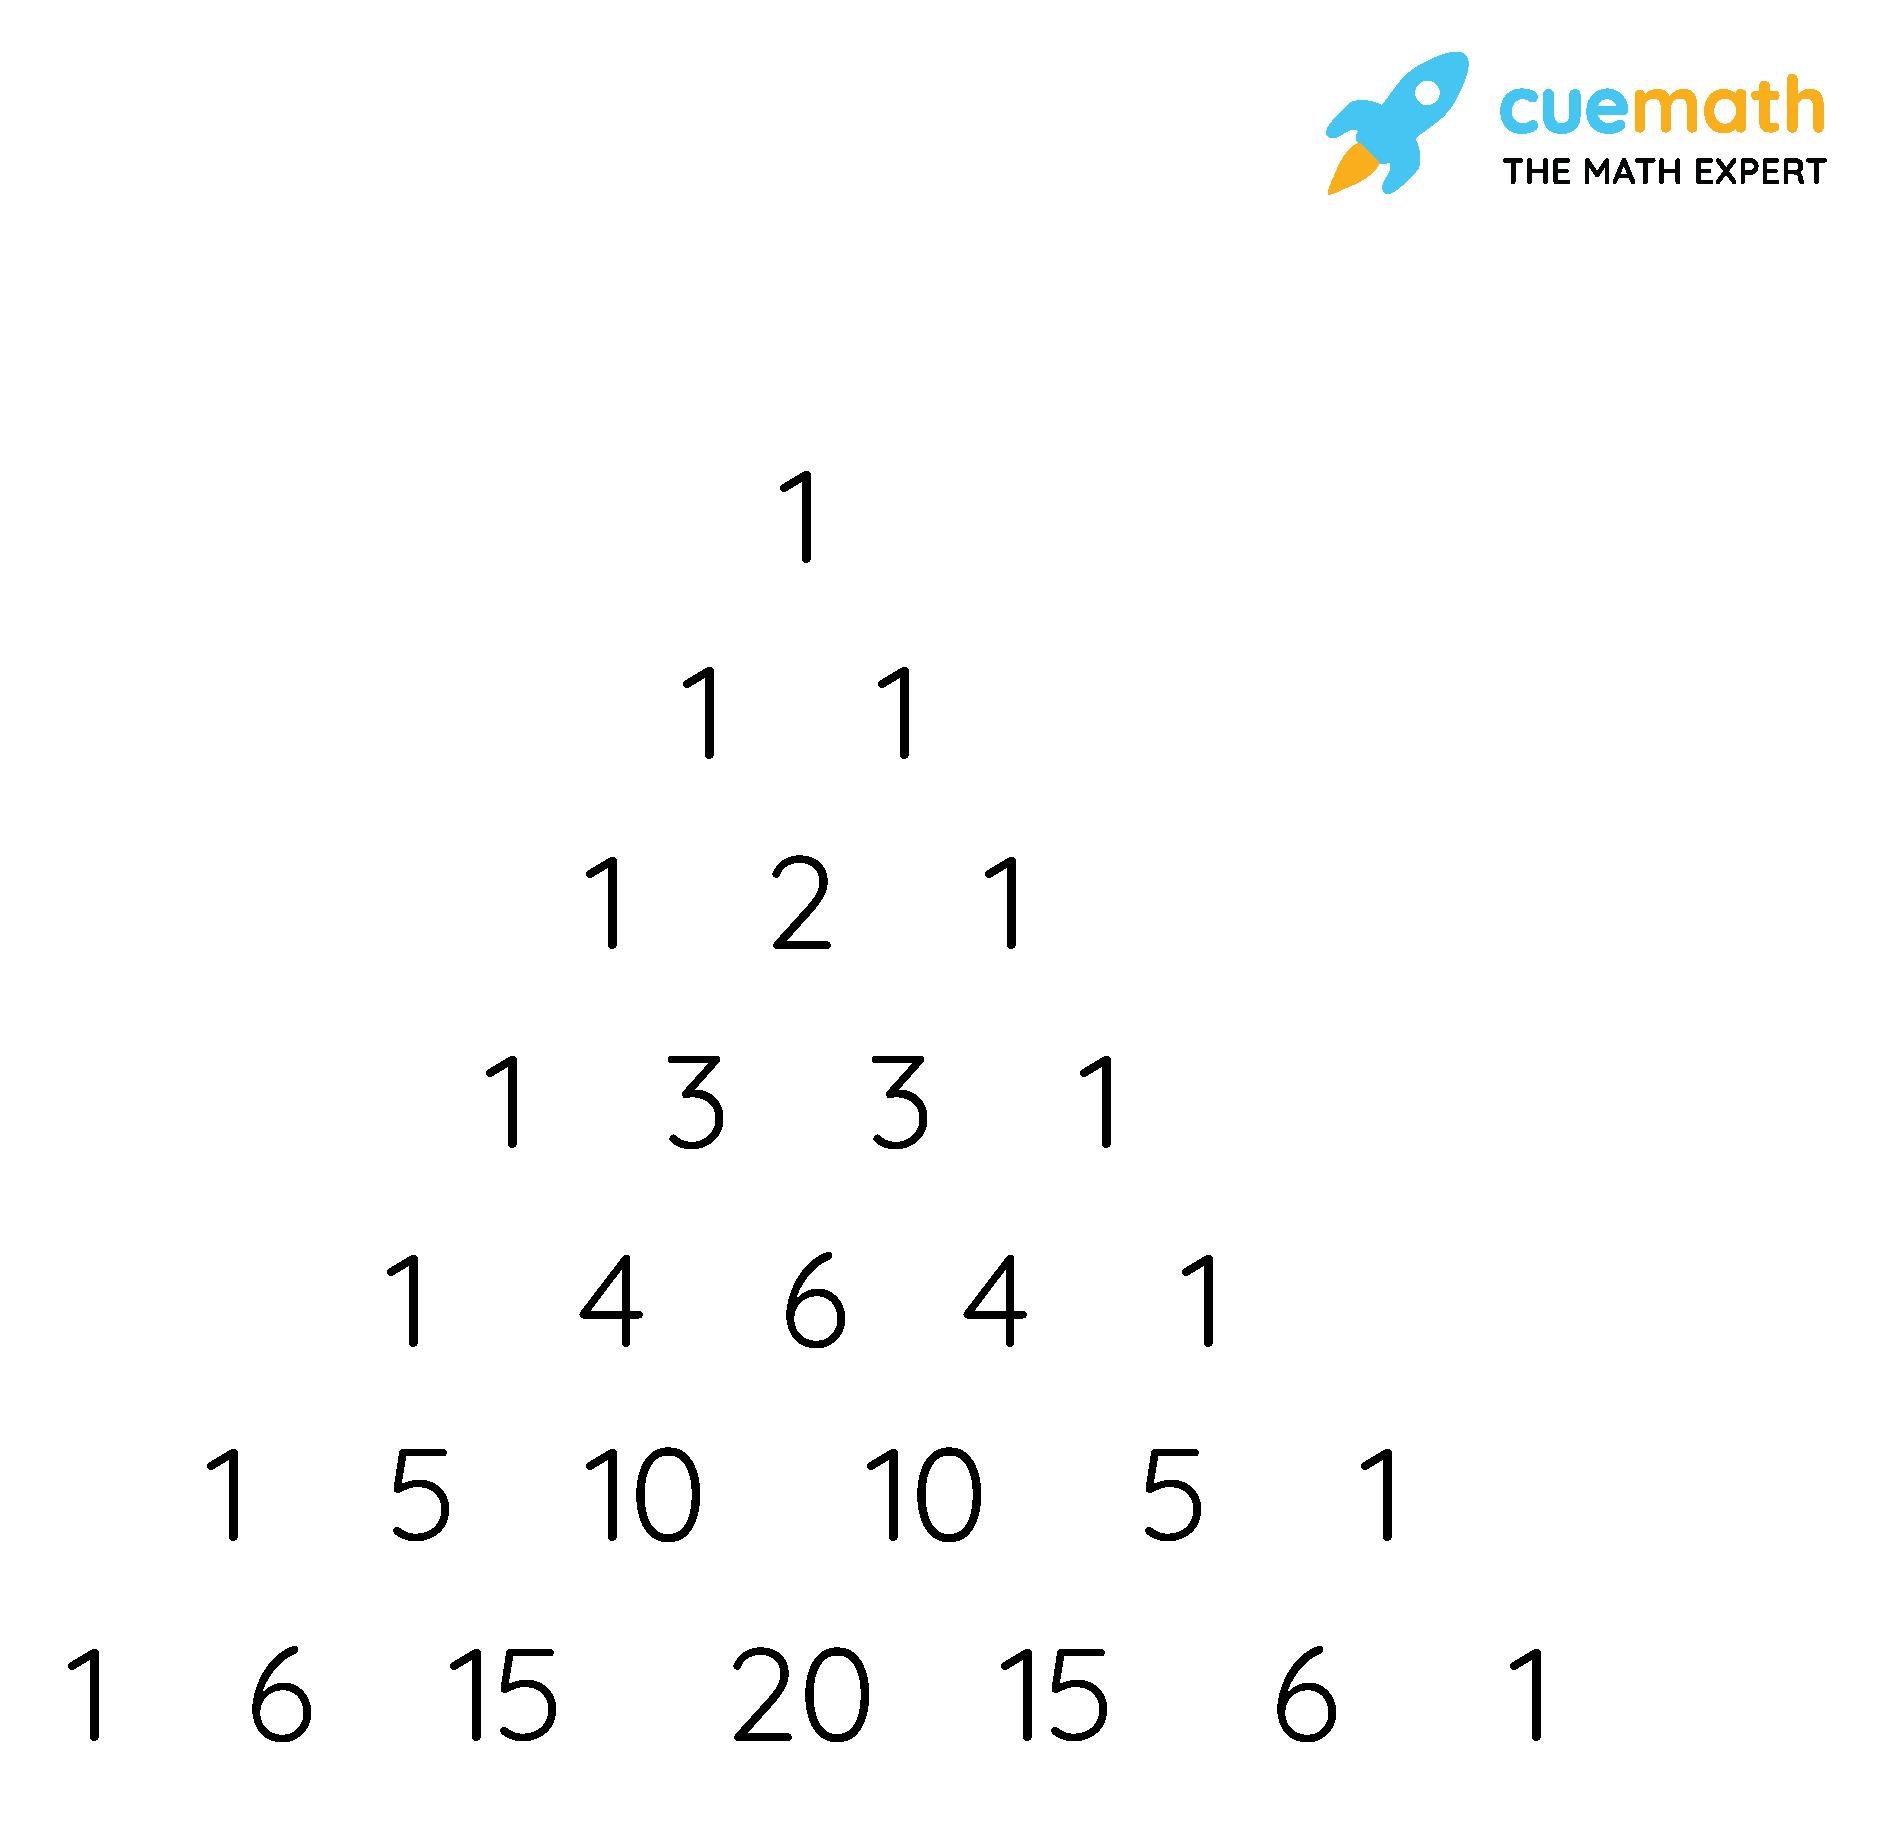 Binomial series using pascal's triangle